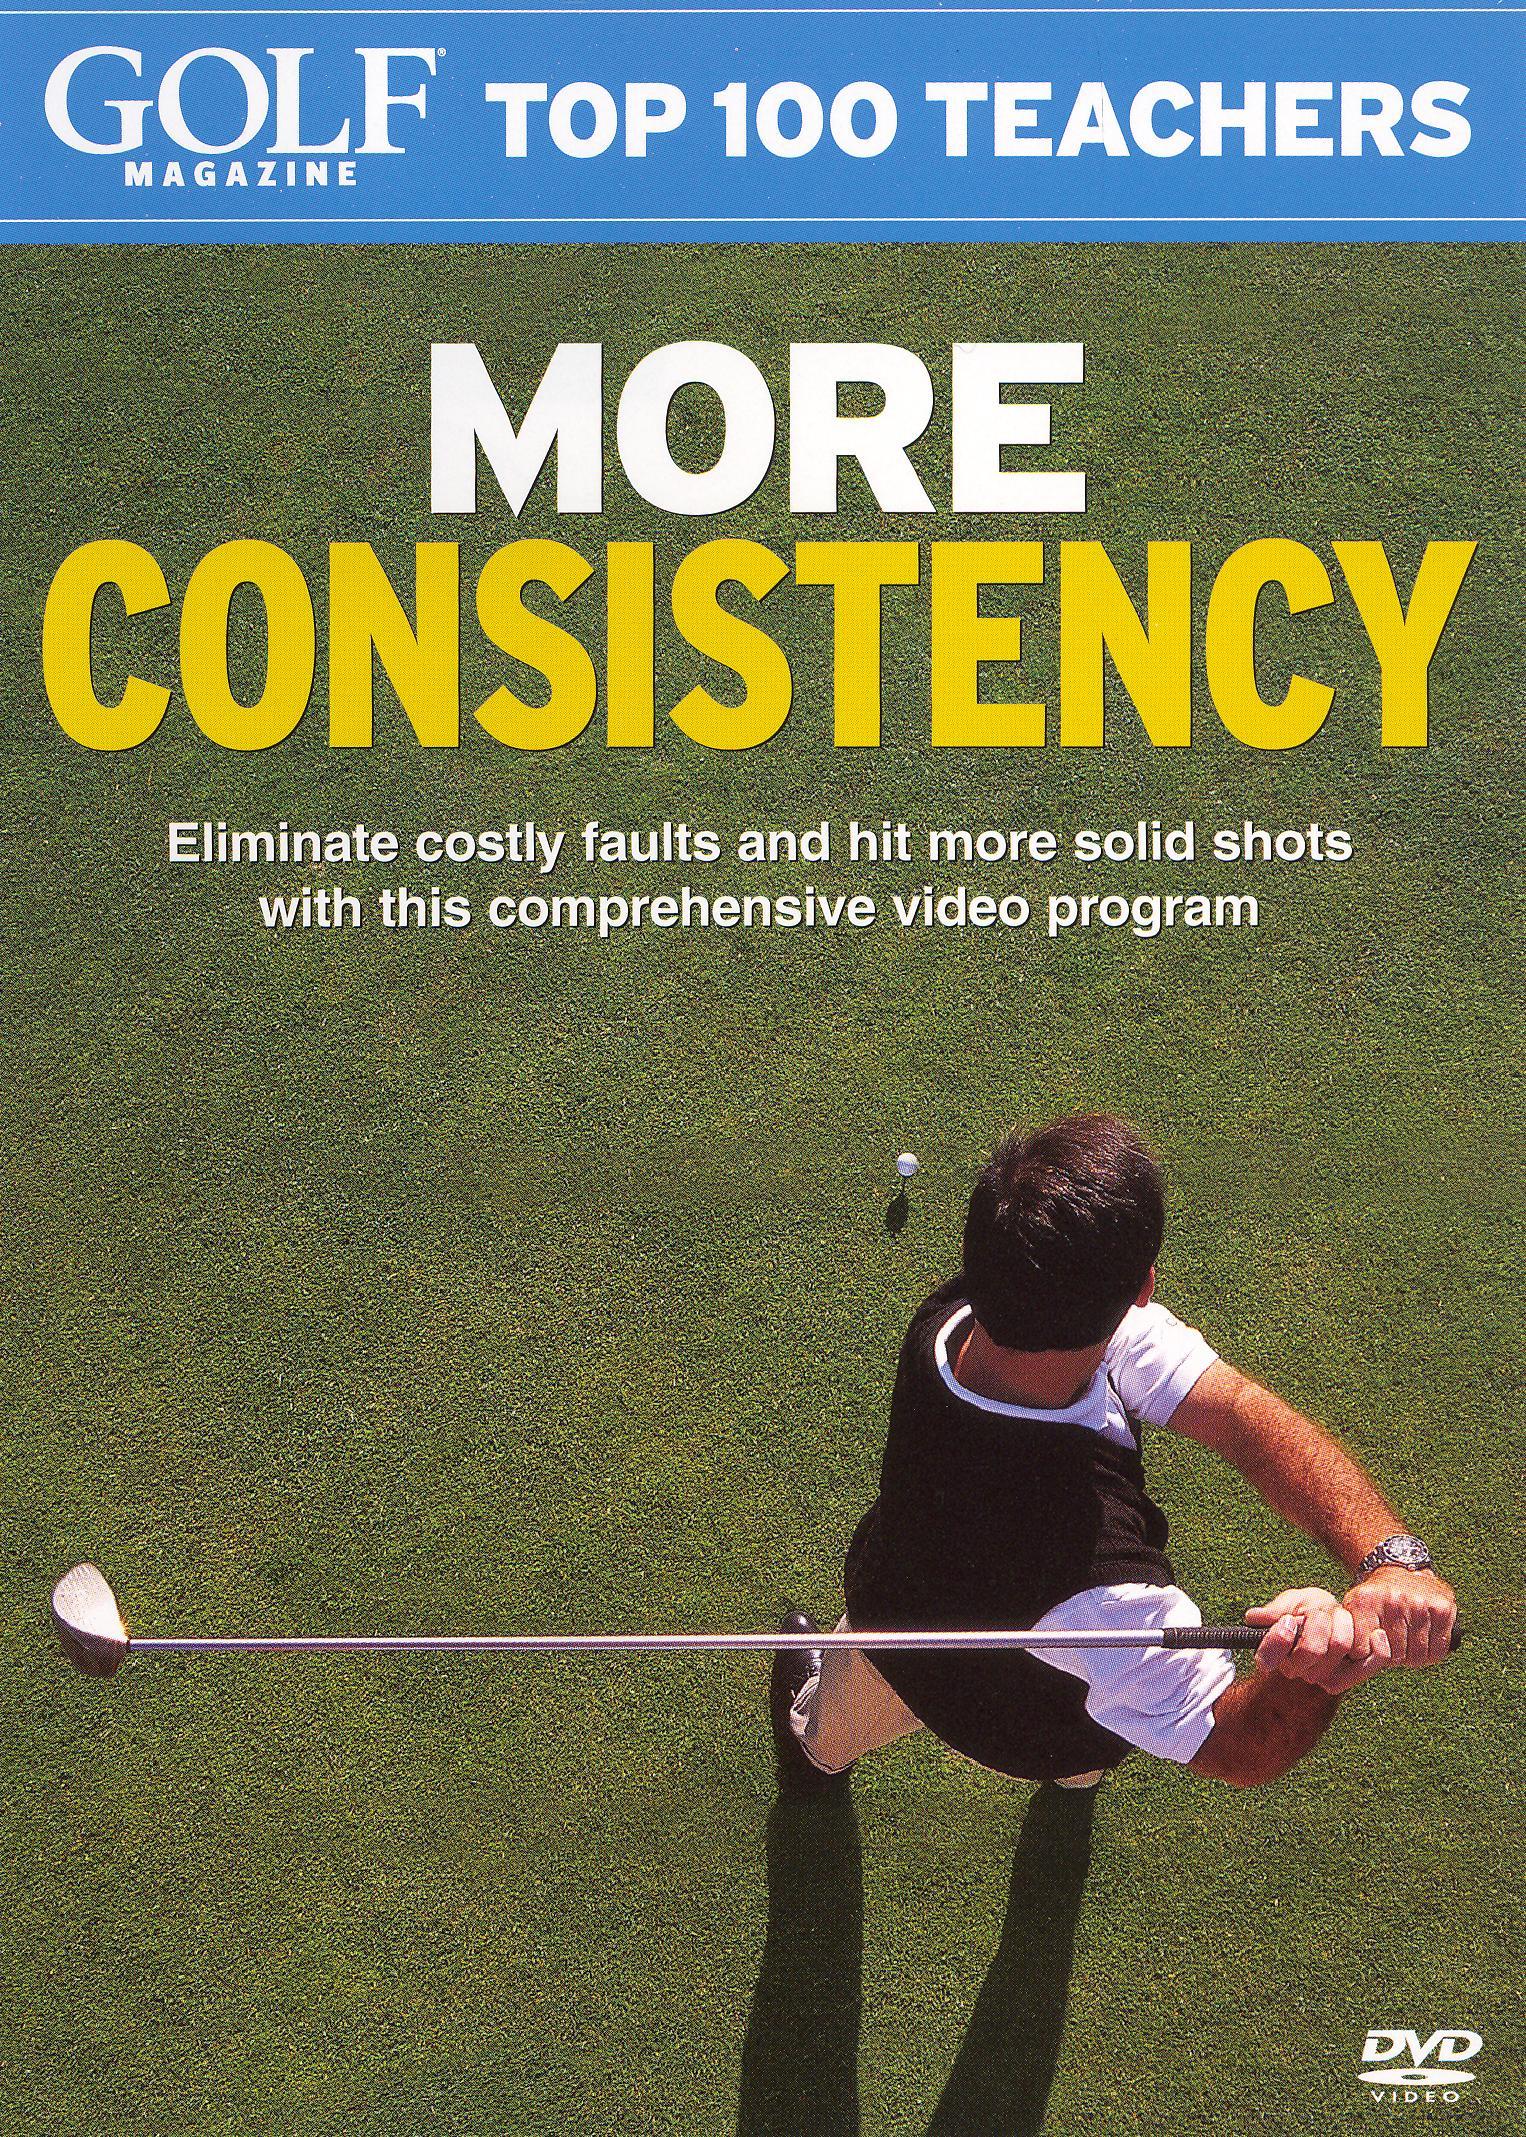 Golf Magazine: Top 100 Teachers - More Consistency